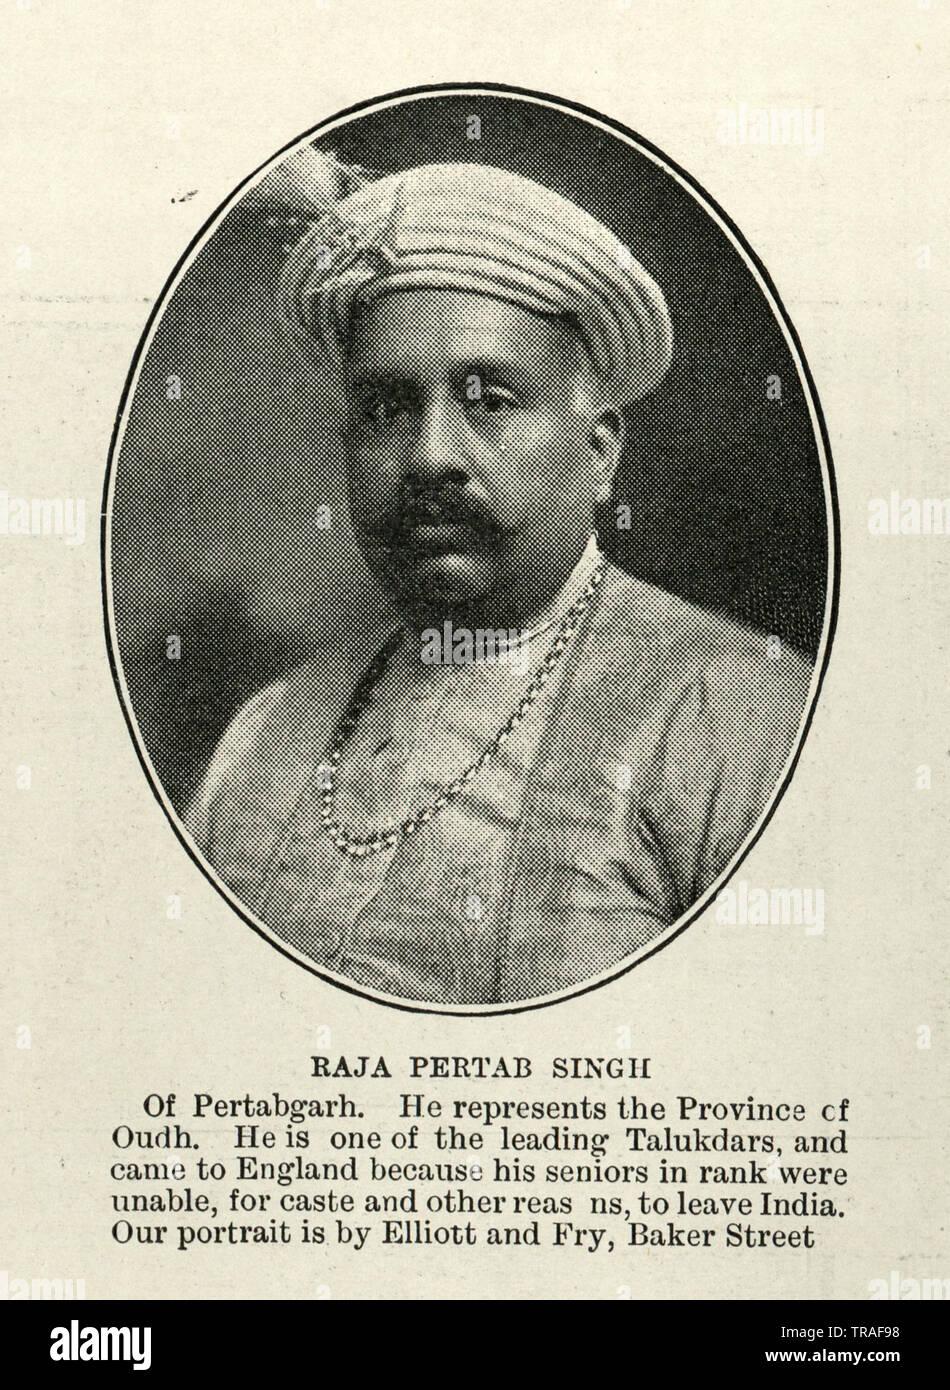 Vintage photograph of Raja Pertab Singh of Pertabgarh, 1902 Stock Photo